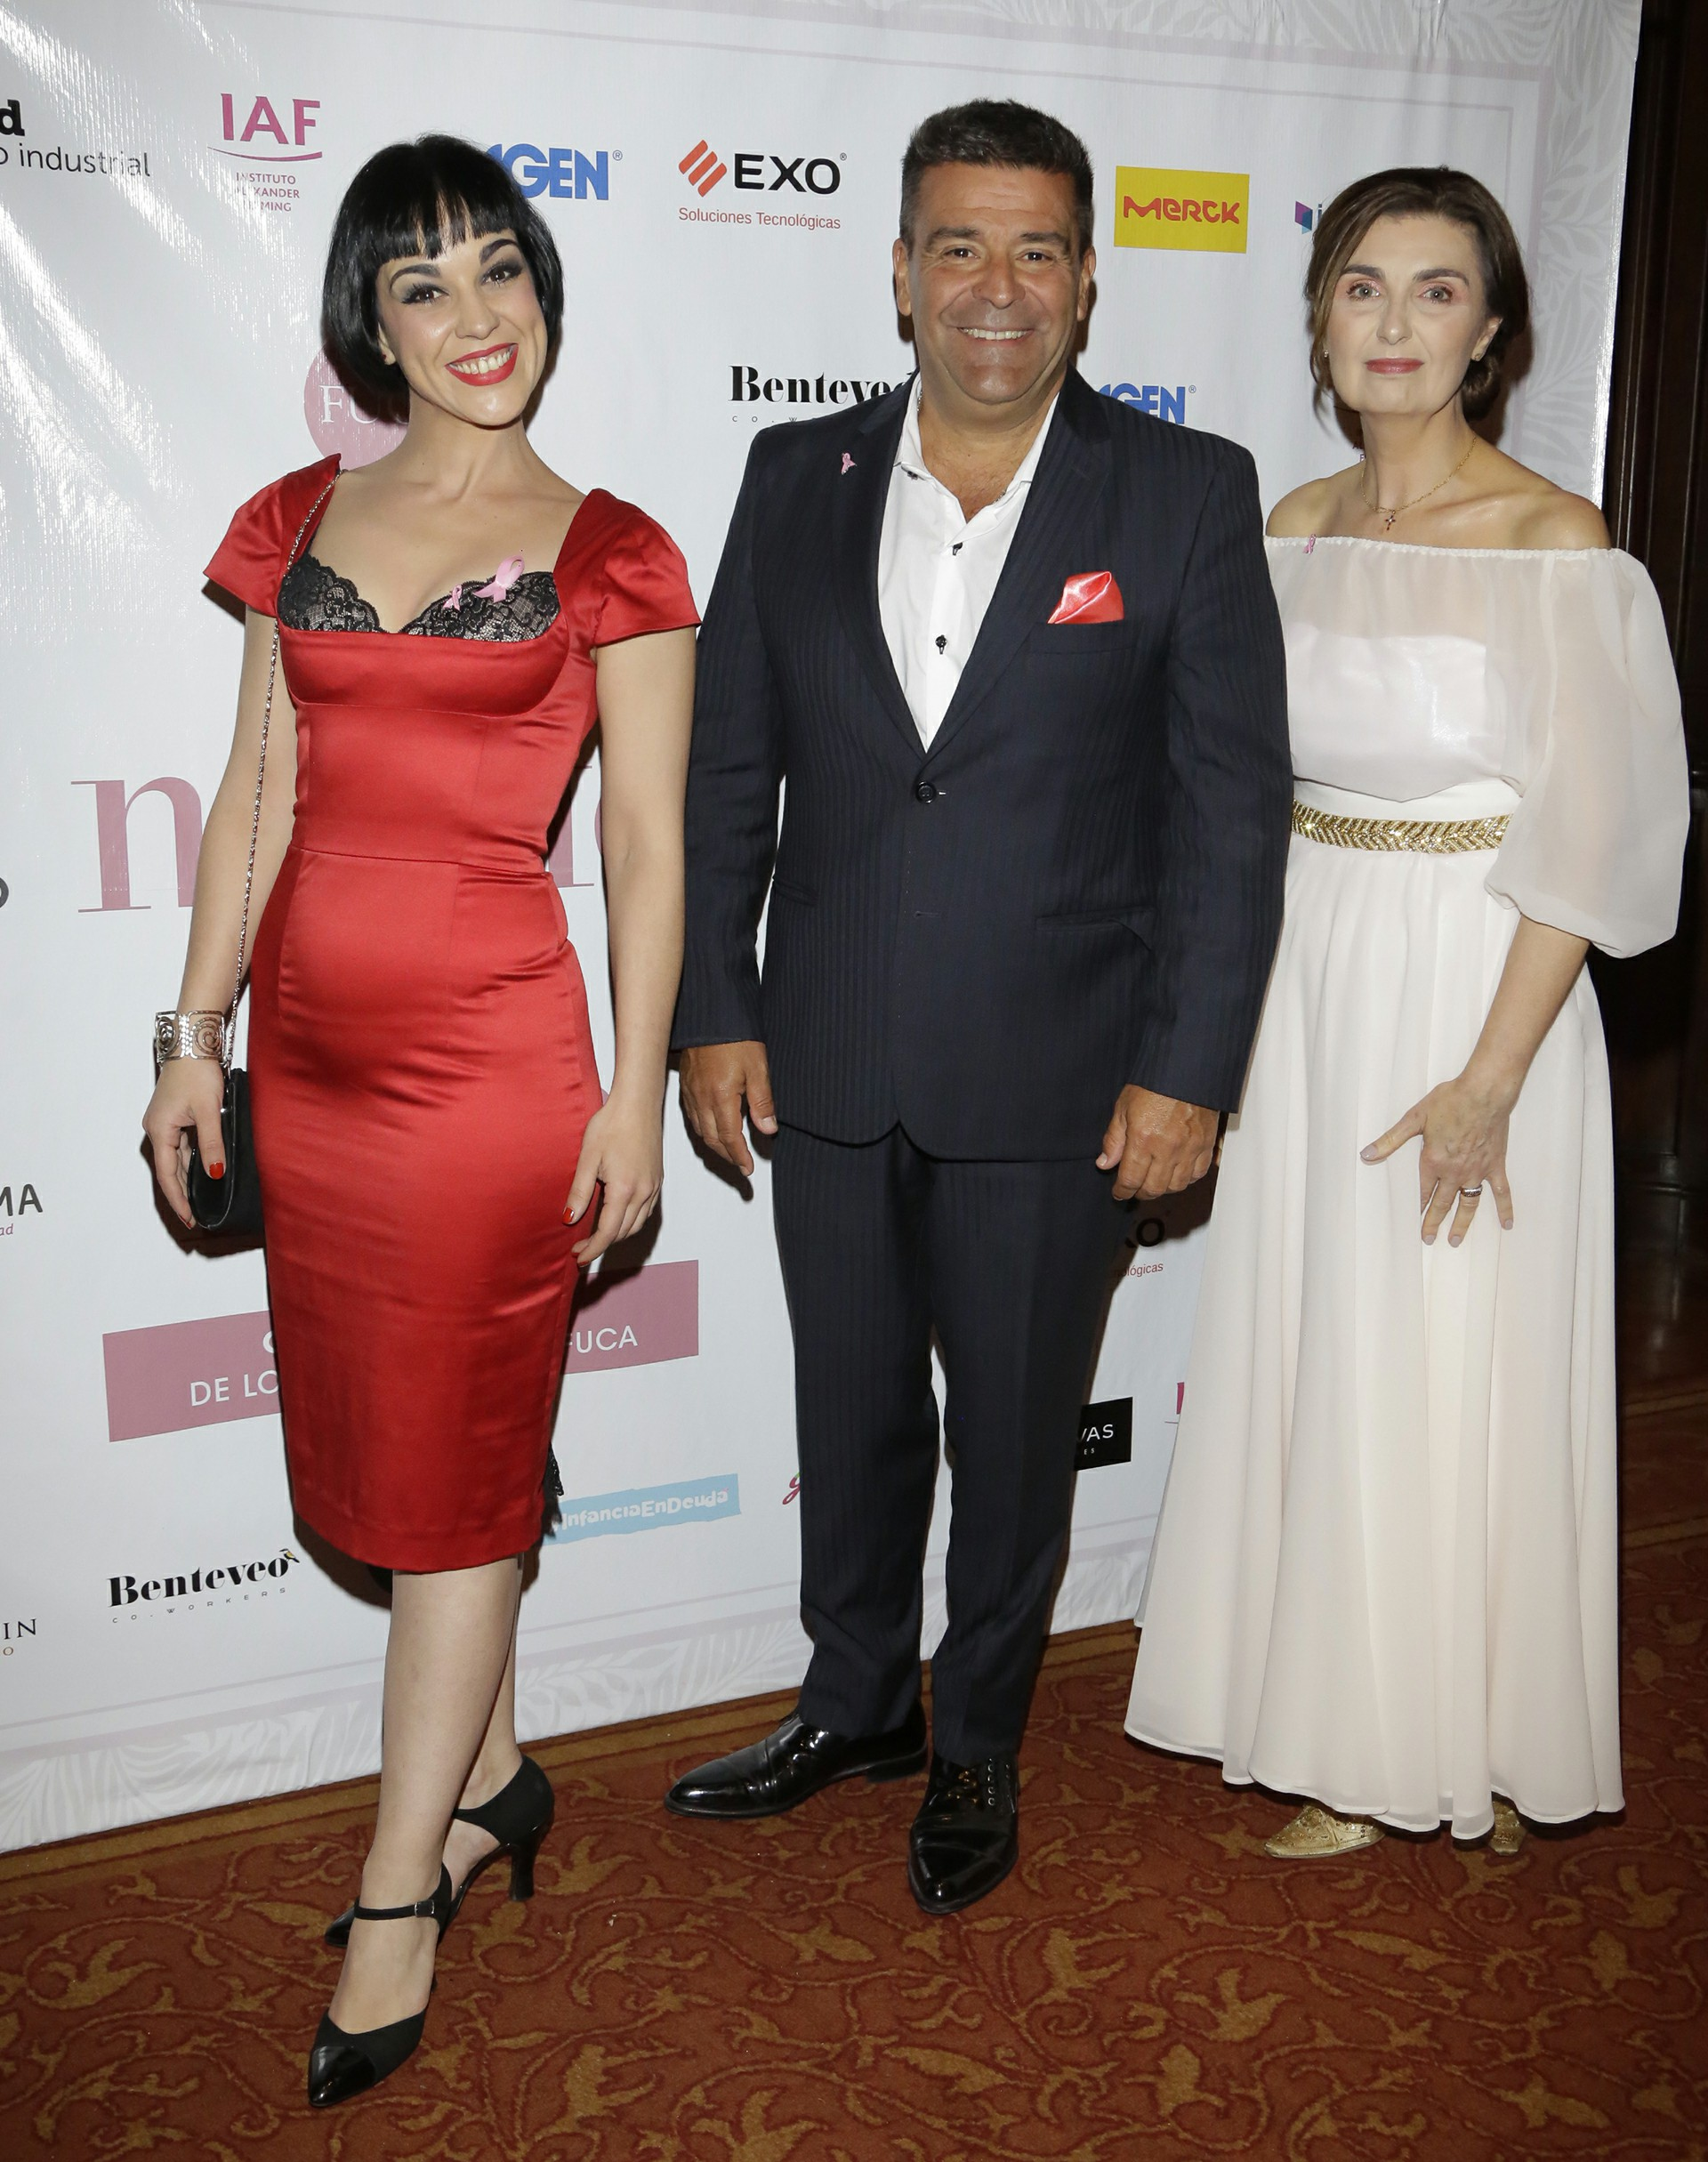 Dolores Bávaro, Chiqui Abecasis y Gabriela Berta